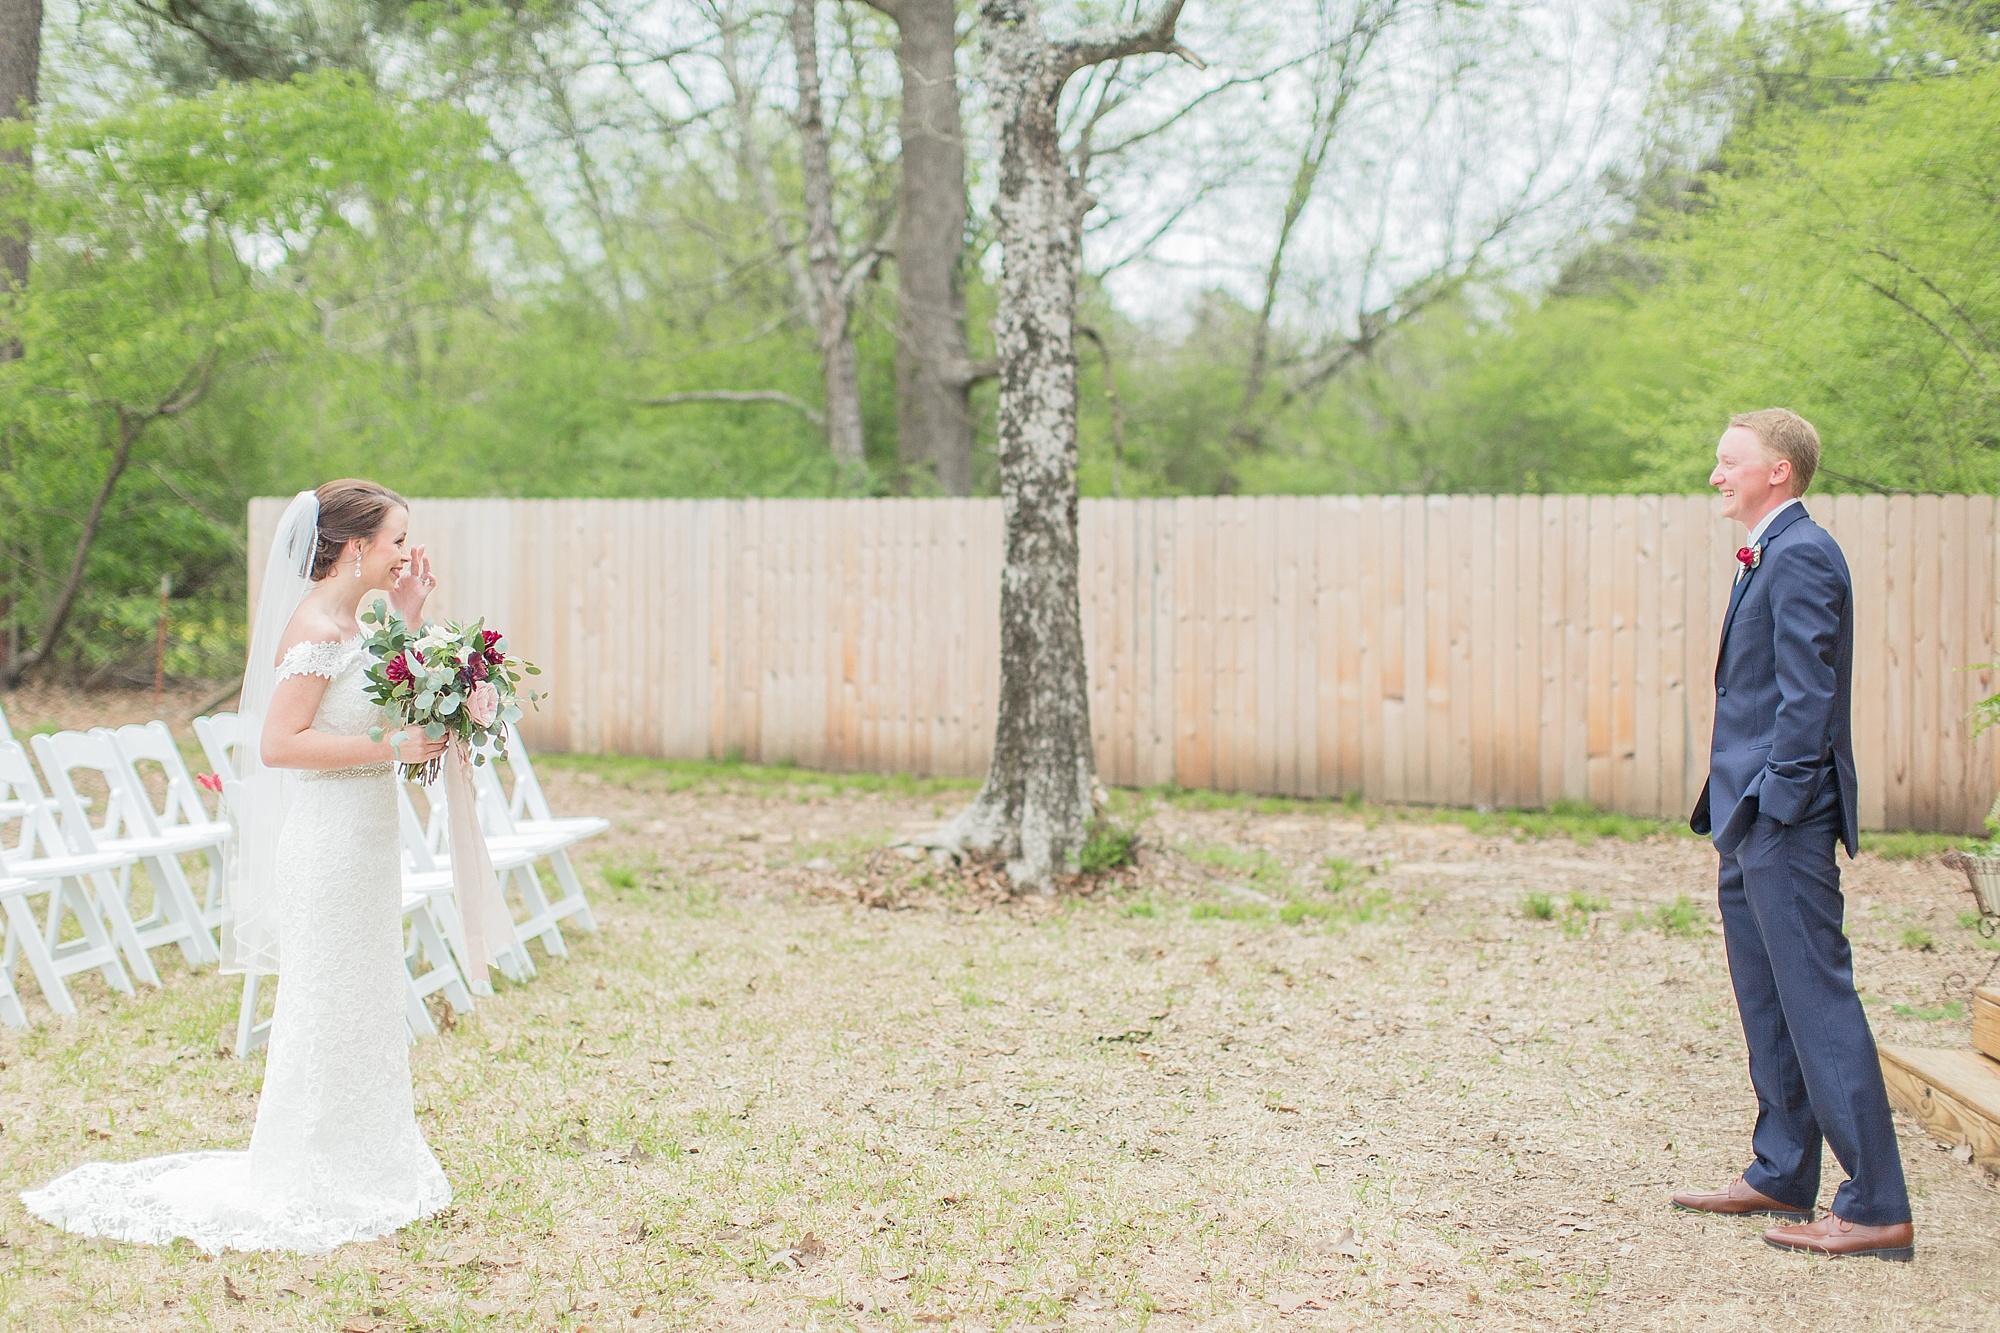 outdoor-mississippi-spring-wedding_0013.jpg